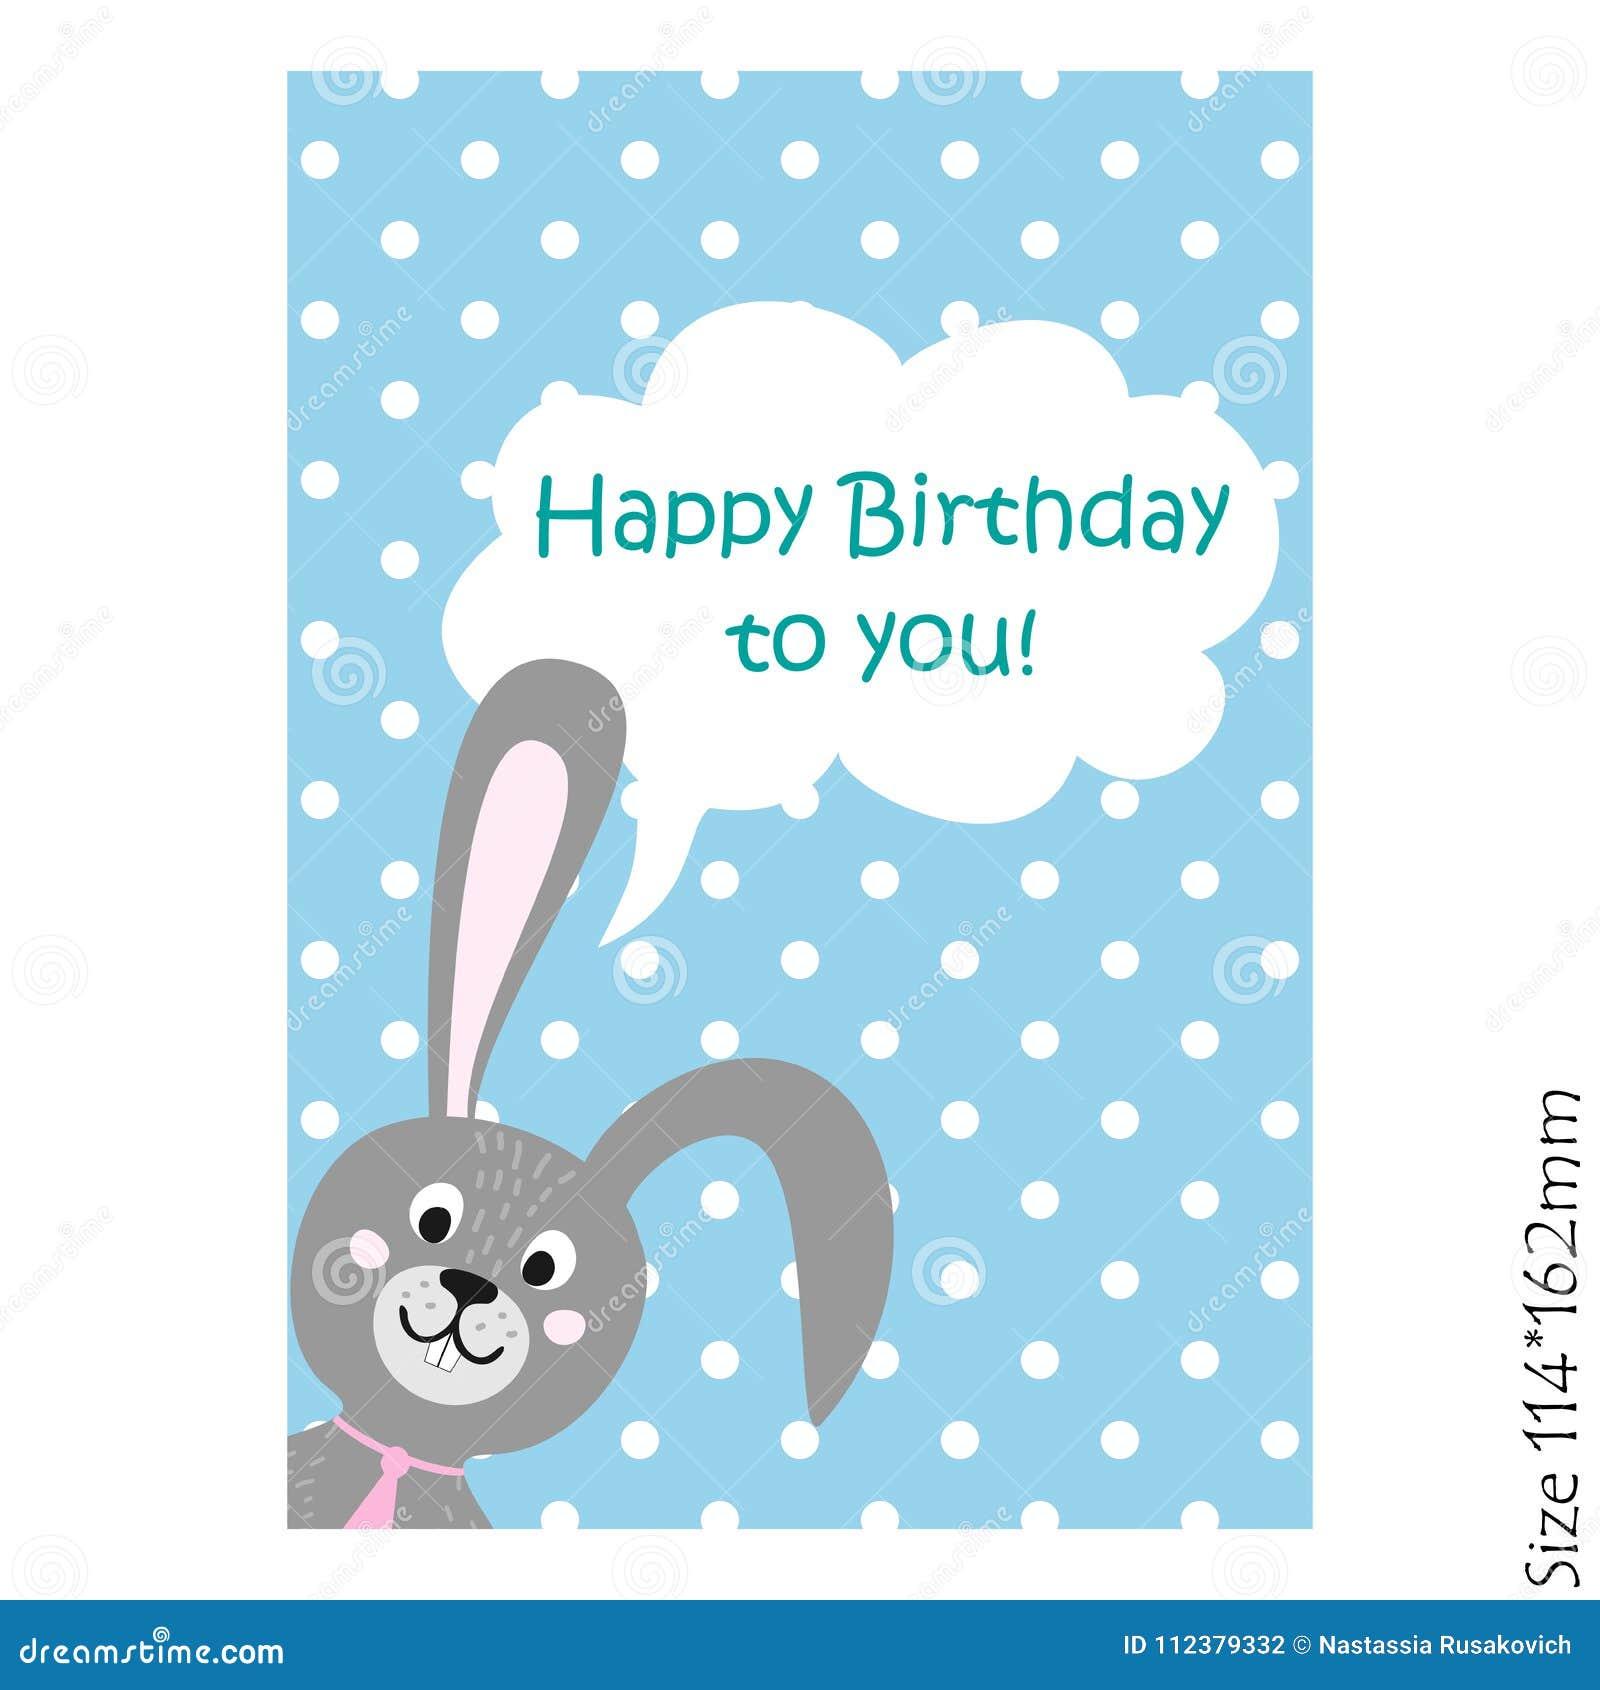 Happy birthday card with Bunny.